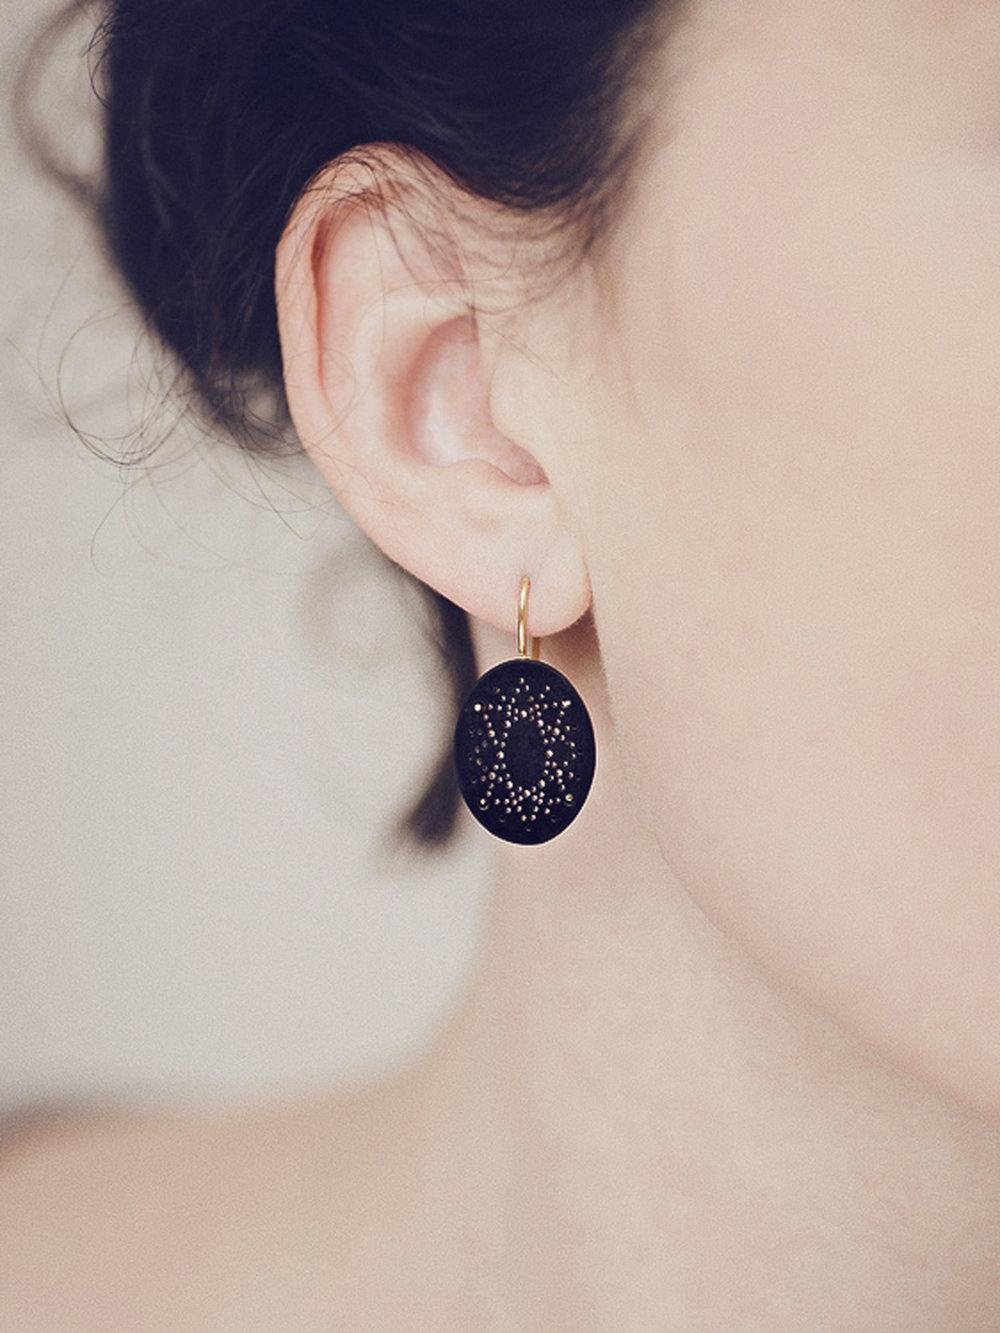 Christina Pauls, Ovale Punkt Ohrringe mit synthetischem Onyx und 585 Gold